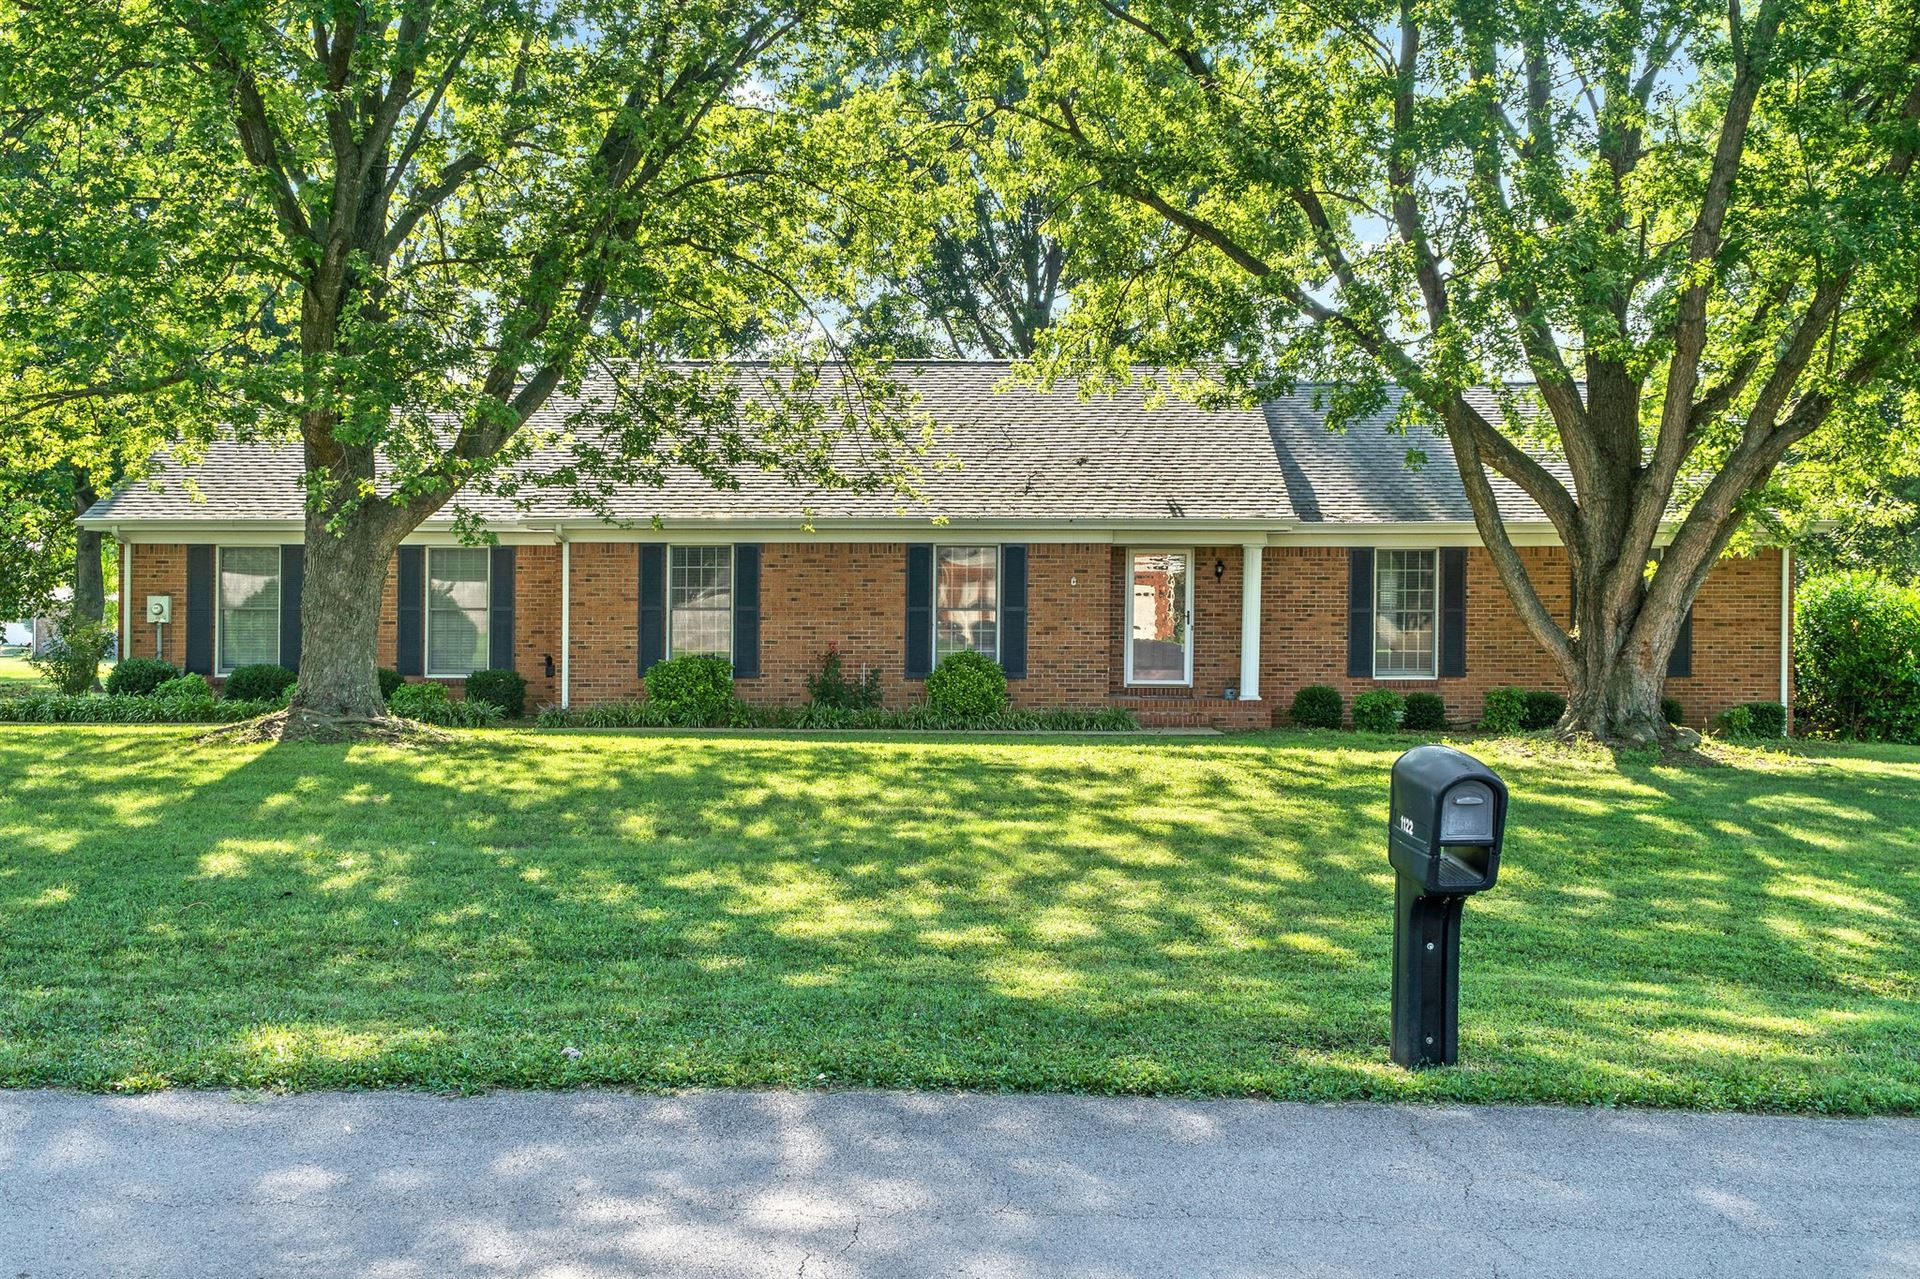 1119 Pin Oak Dr, Hopkinsville, KY 42240 - MLS#: 2285381